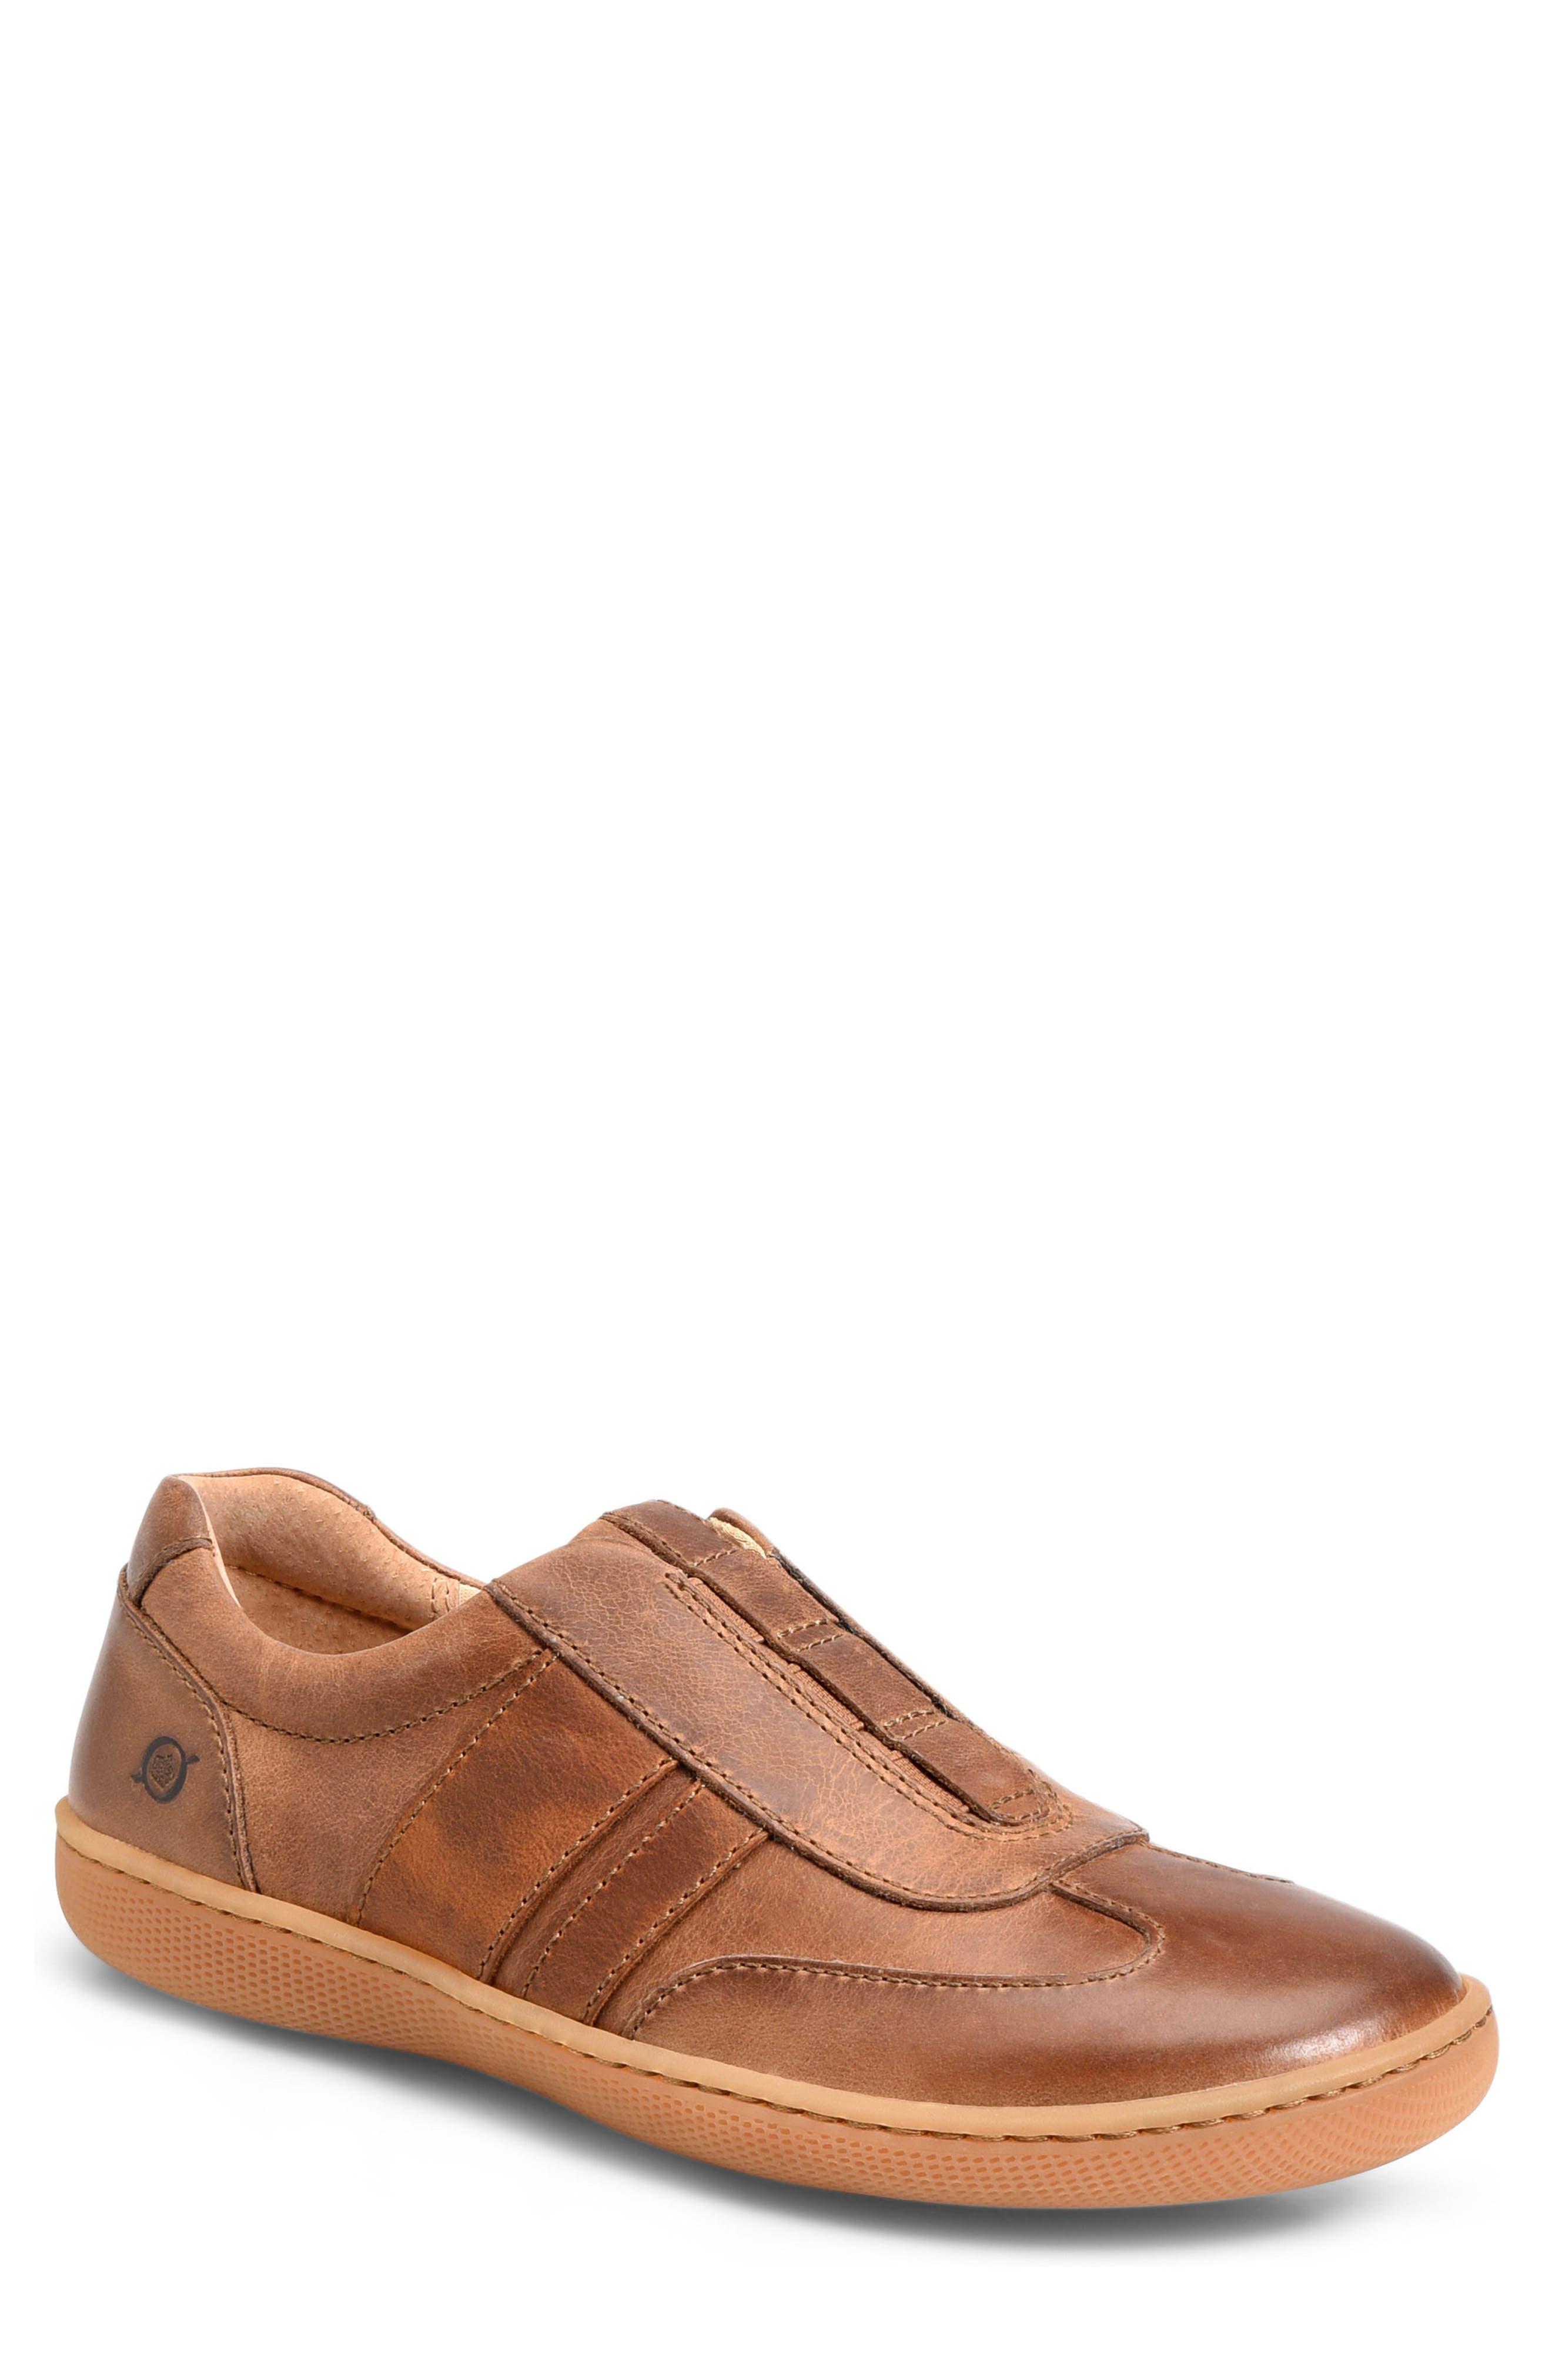 Børn Maros Slip-On Sneaker (Men)